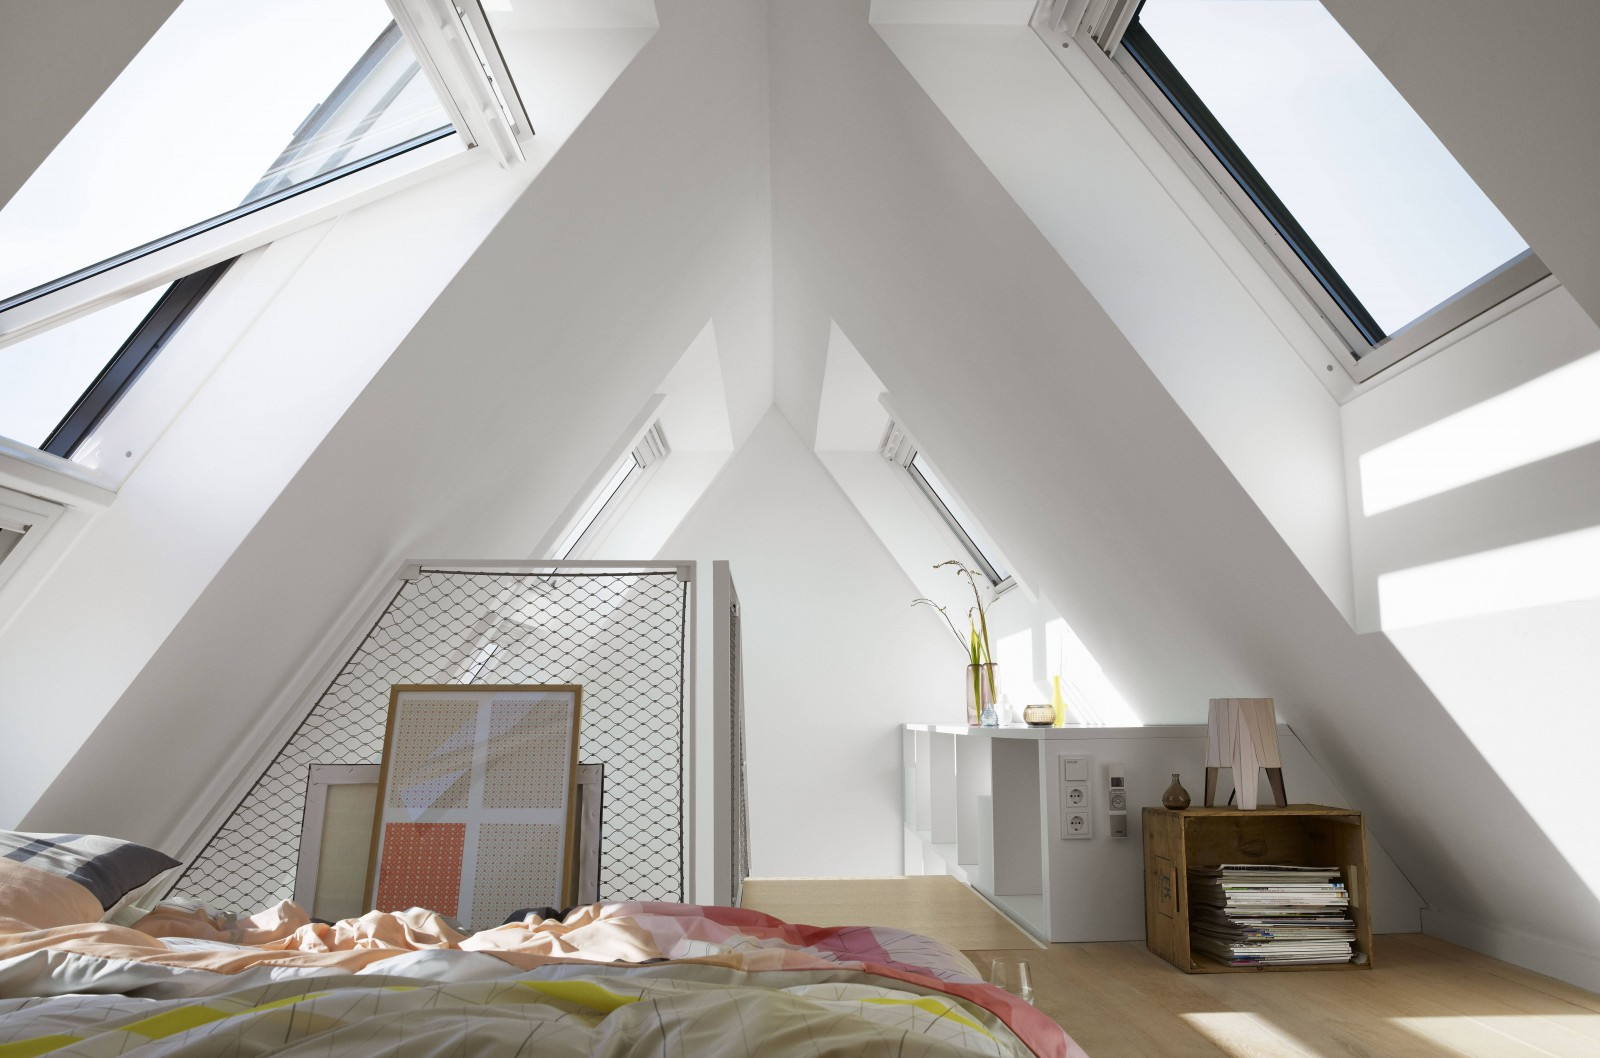 volet roulant solaire velux credit impot stunning credit dimpt velux isere with volet roulant. Black Bedroom Furniture Sets. Home Design Ideas